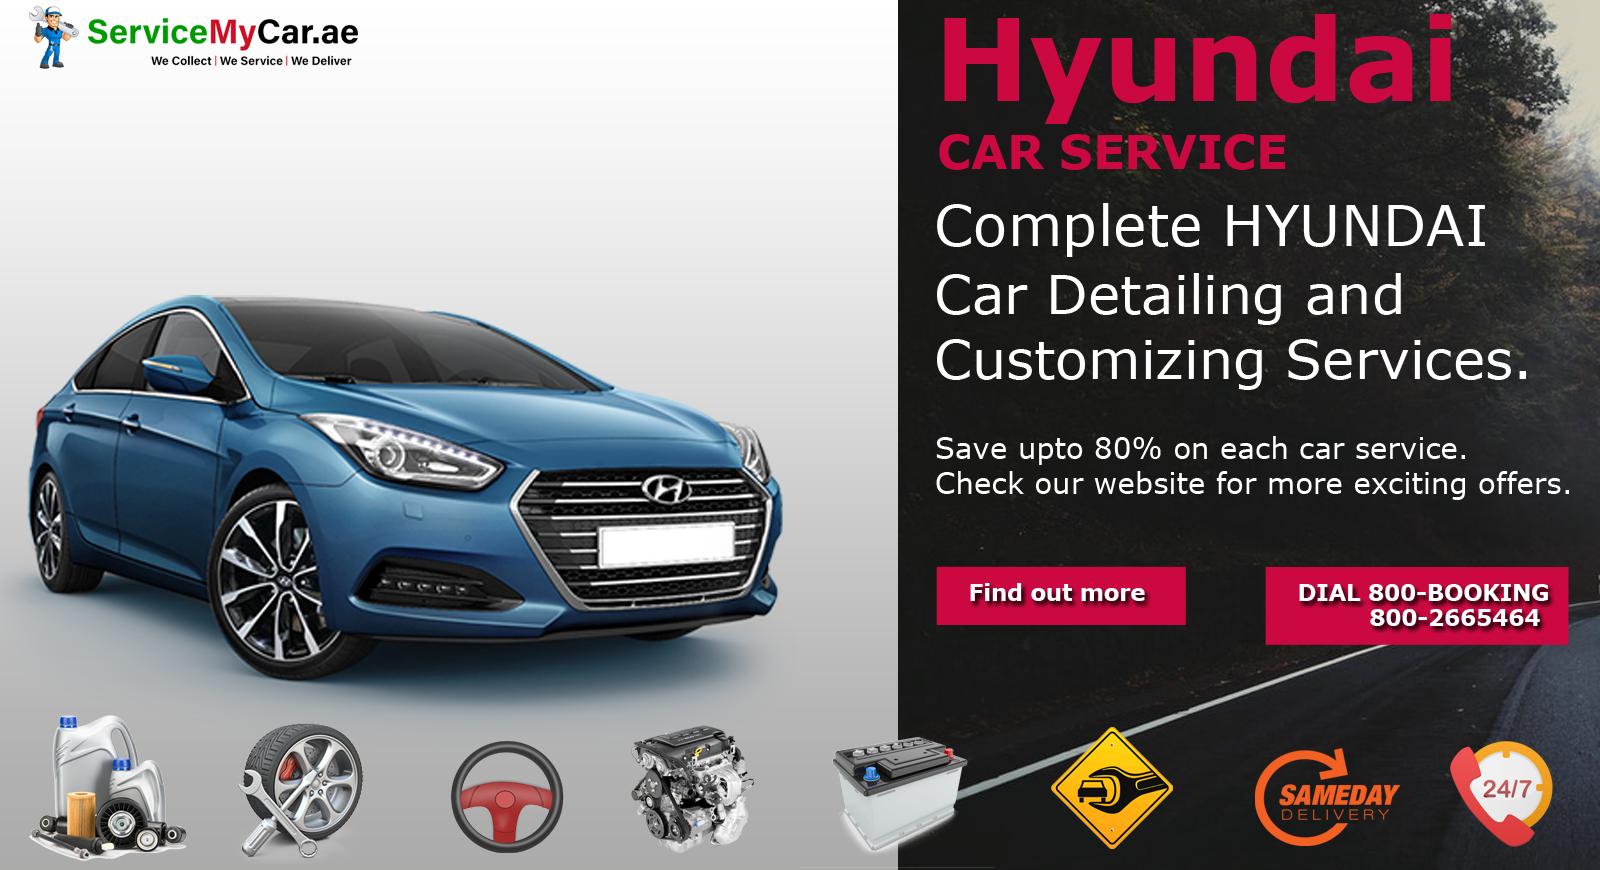 Hyundai Car Service In Dubai Uae Hyundai Cars Car Repair Service Hyundai